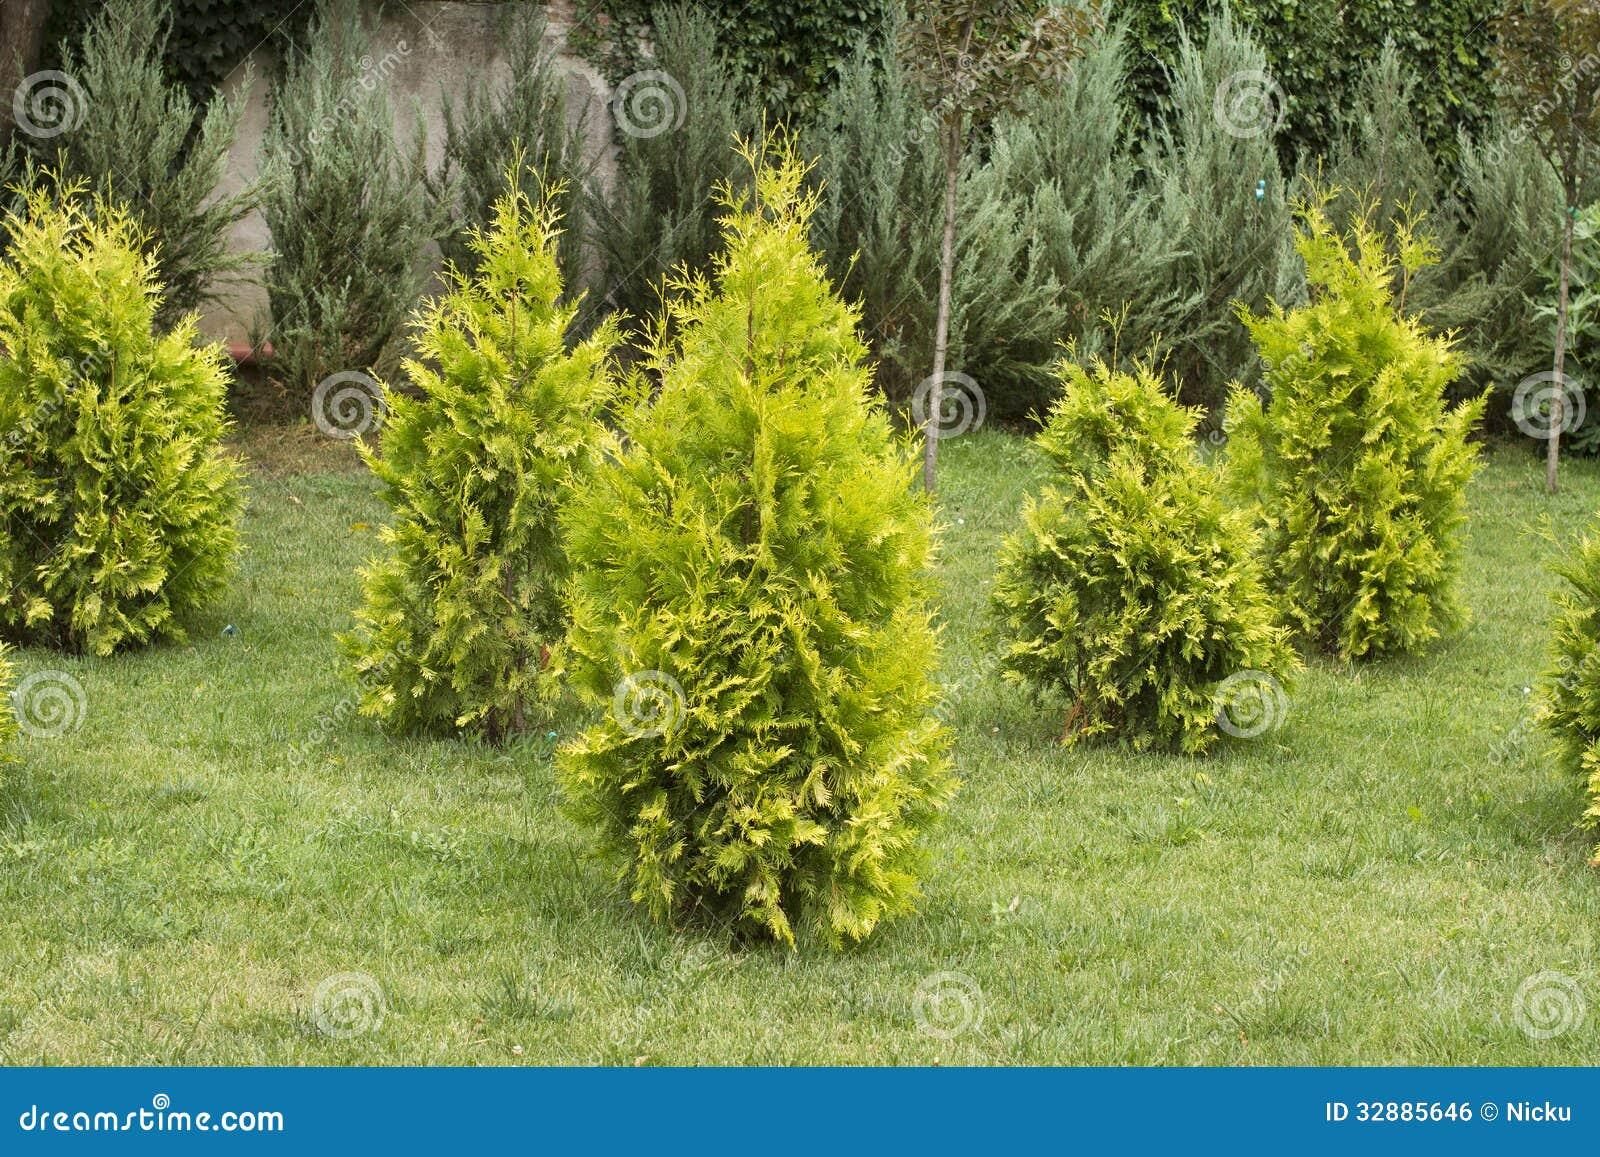 Decorative Blue Spruce : Garden decorative small spruce royalty free stock image